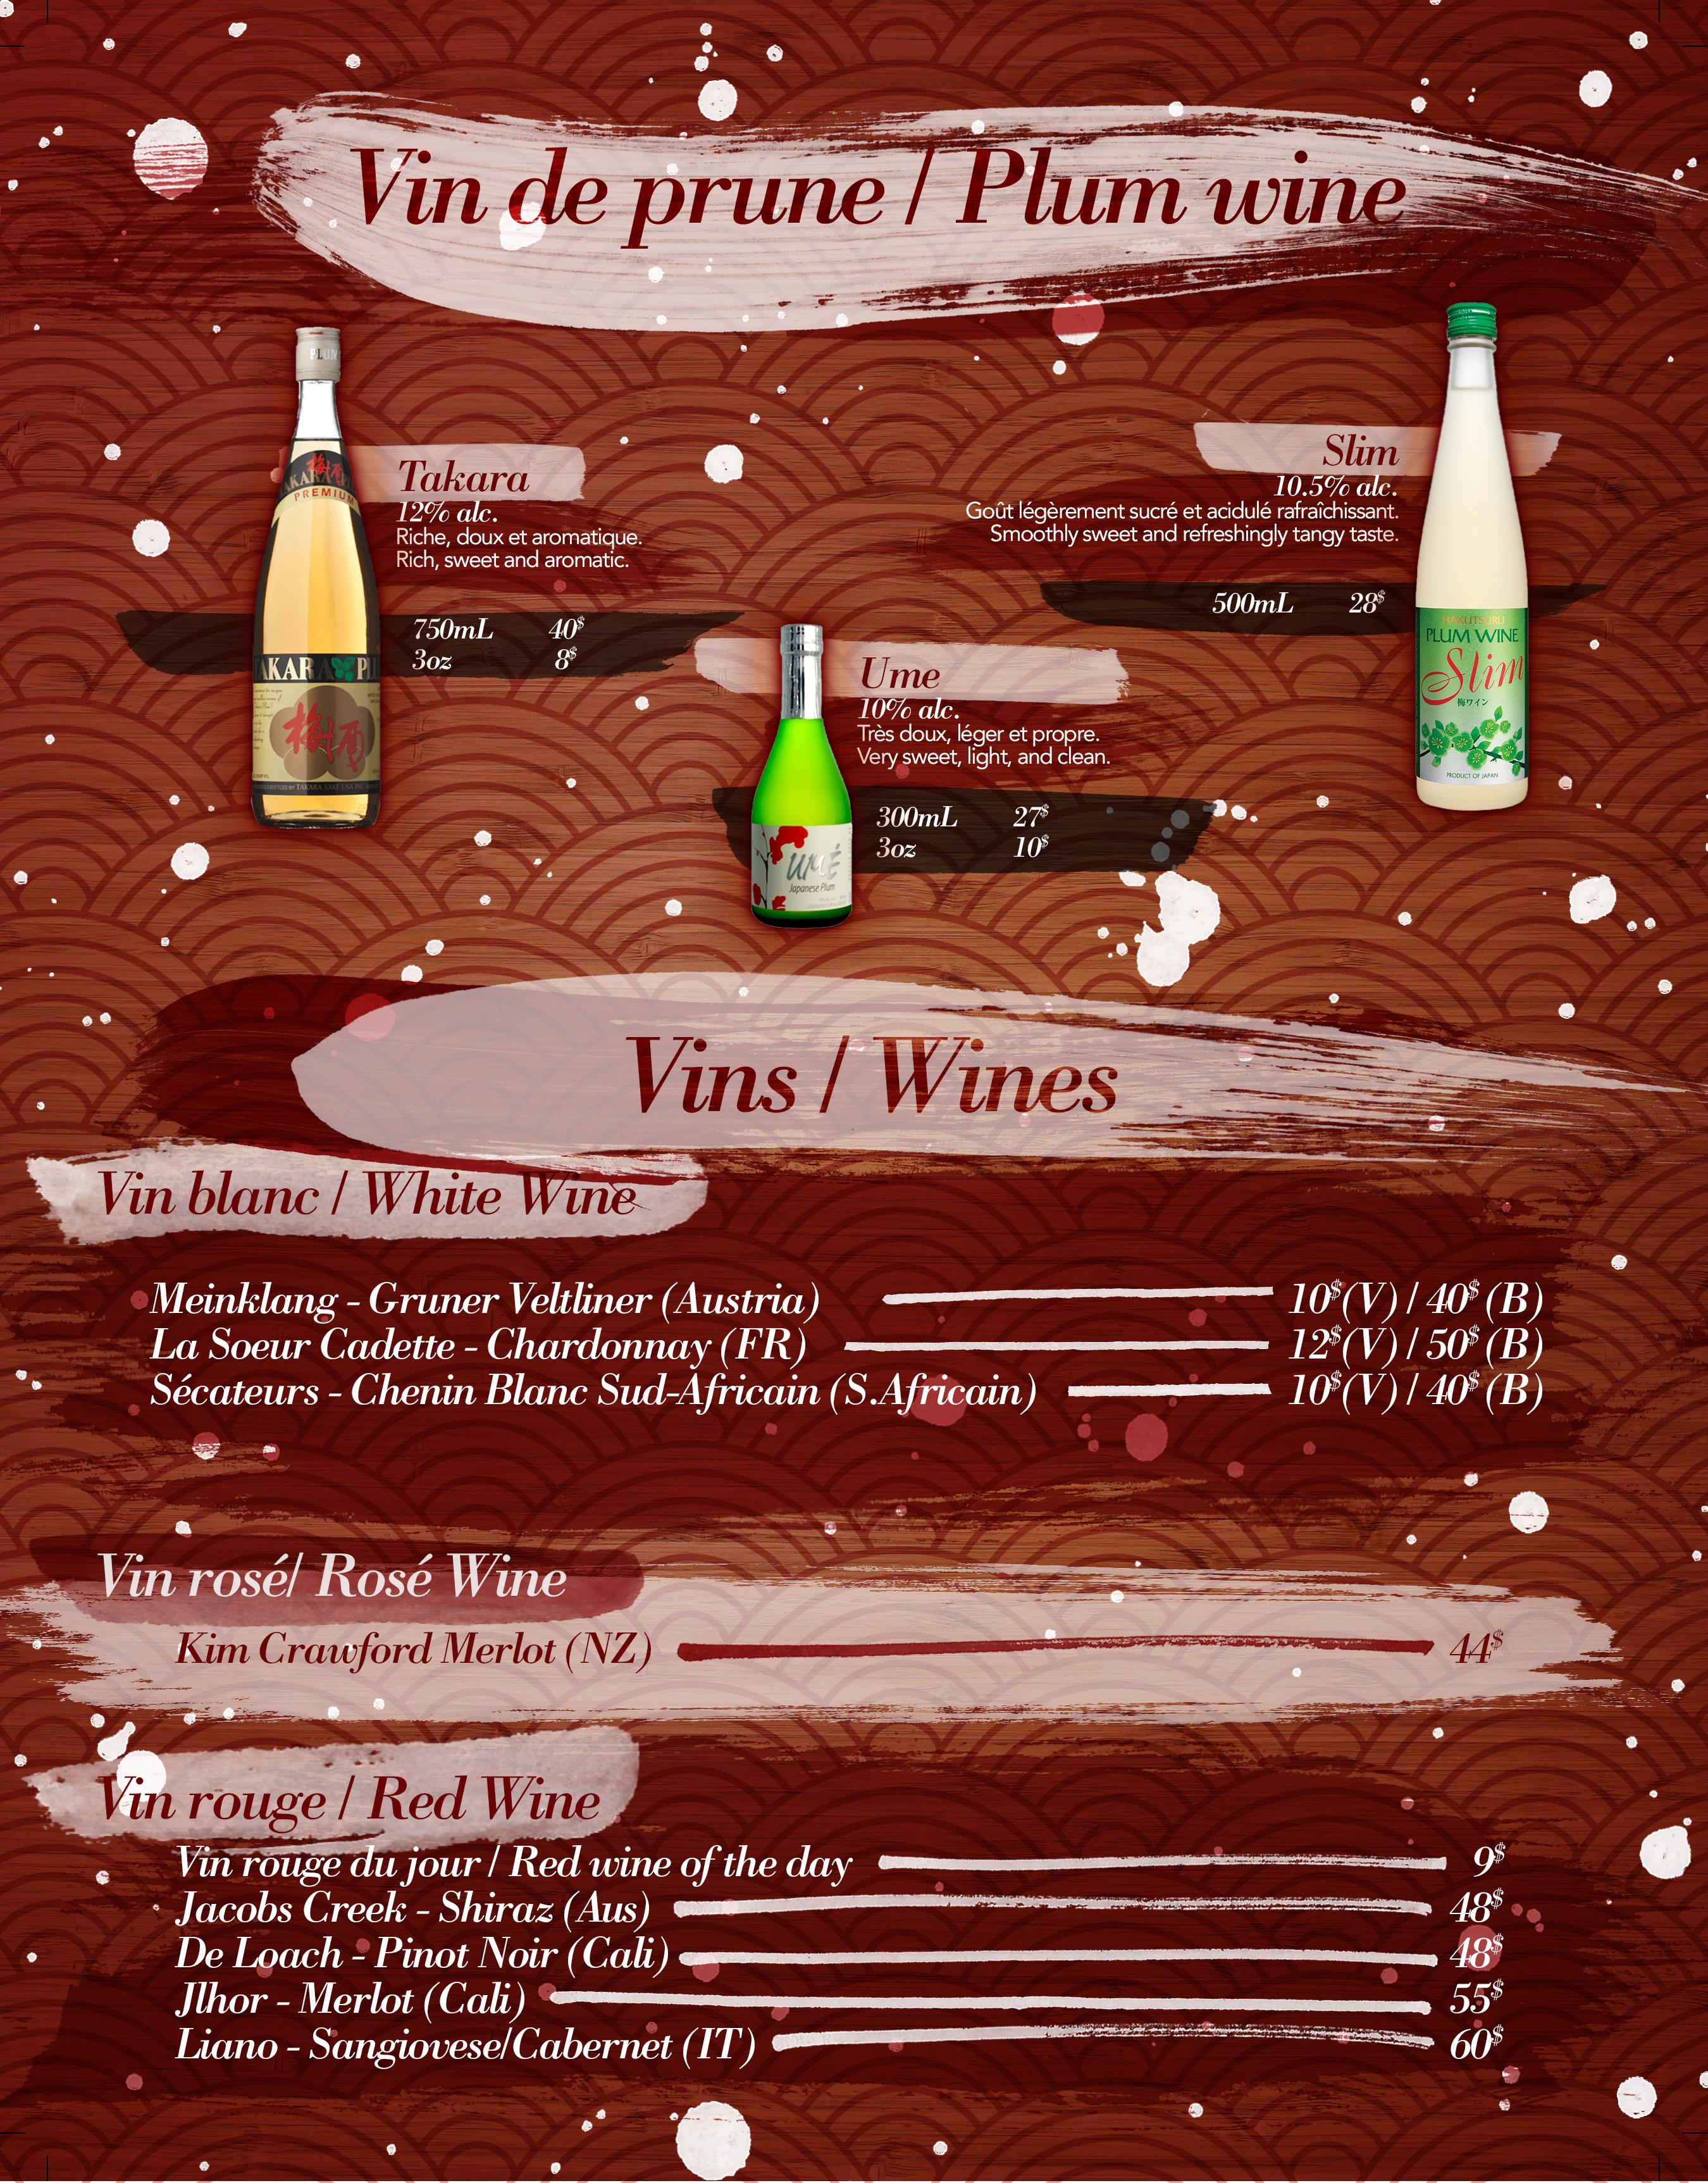 drinkswineplum wines _ wines